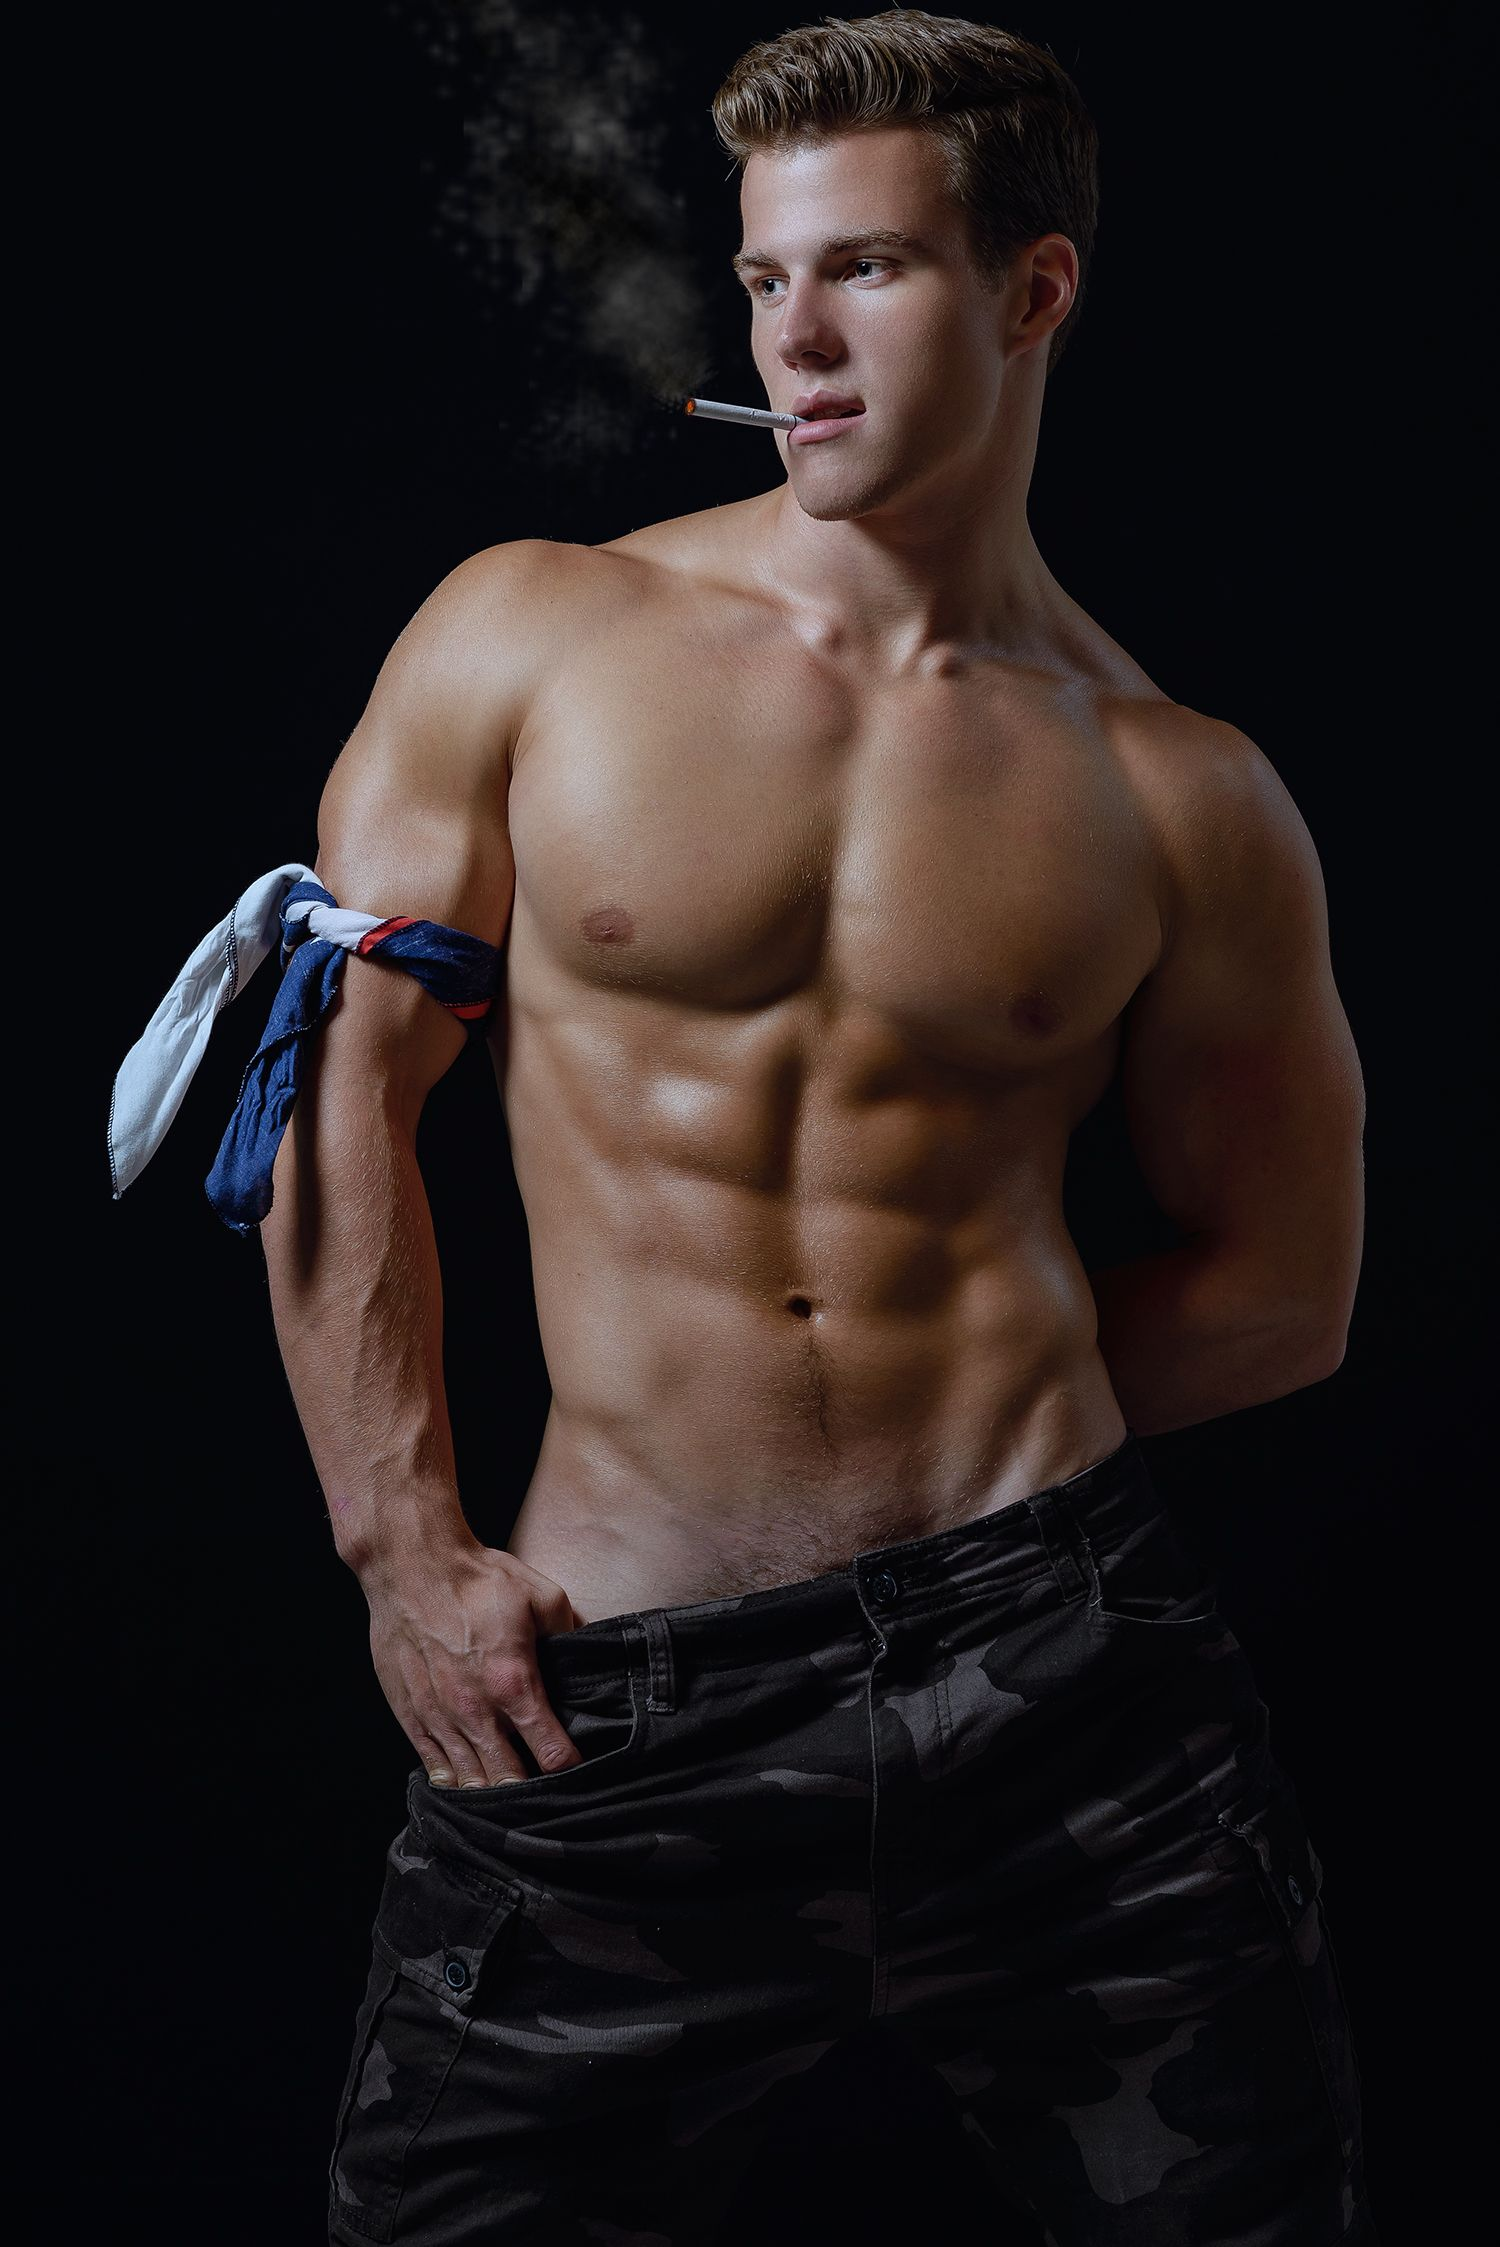 Free smoking gay male pics